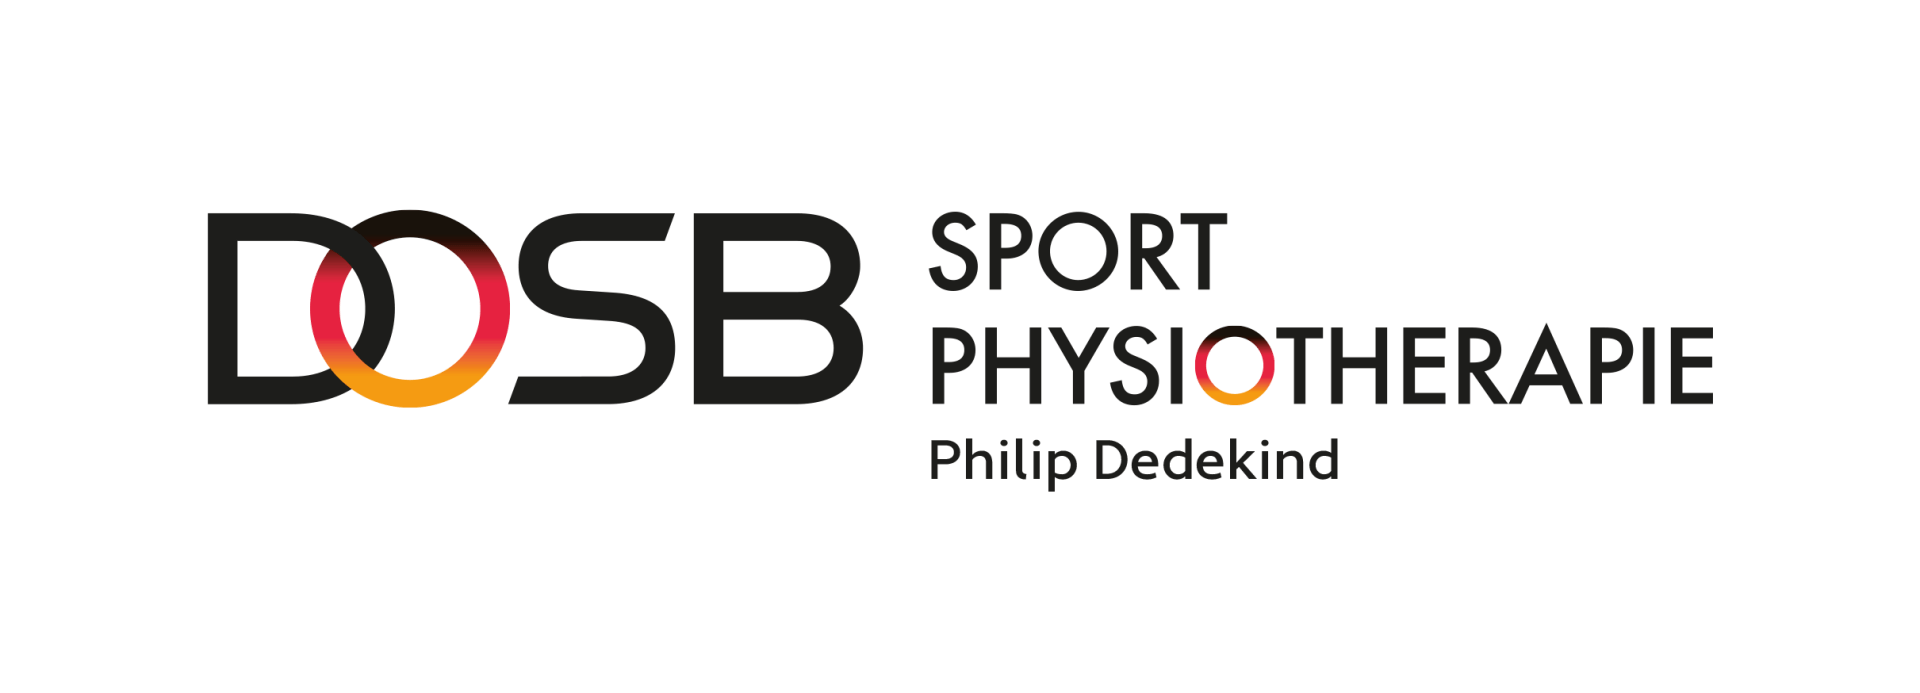 DOSB Sportphysiotherapeut Philip Dedekind